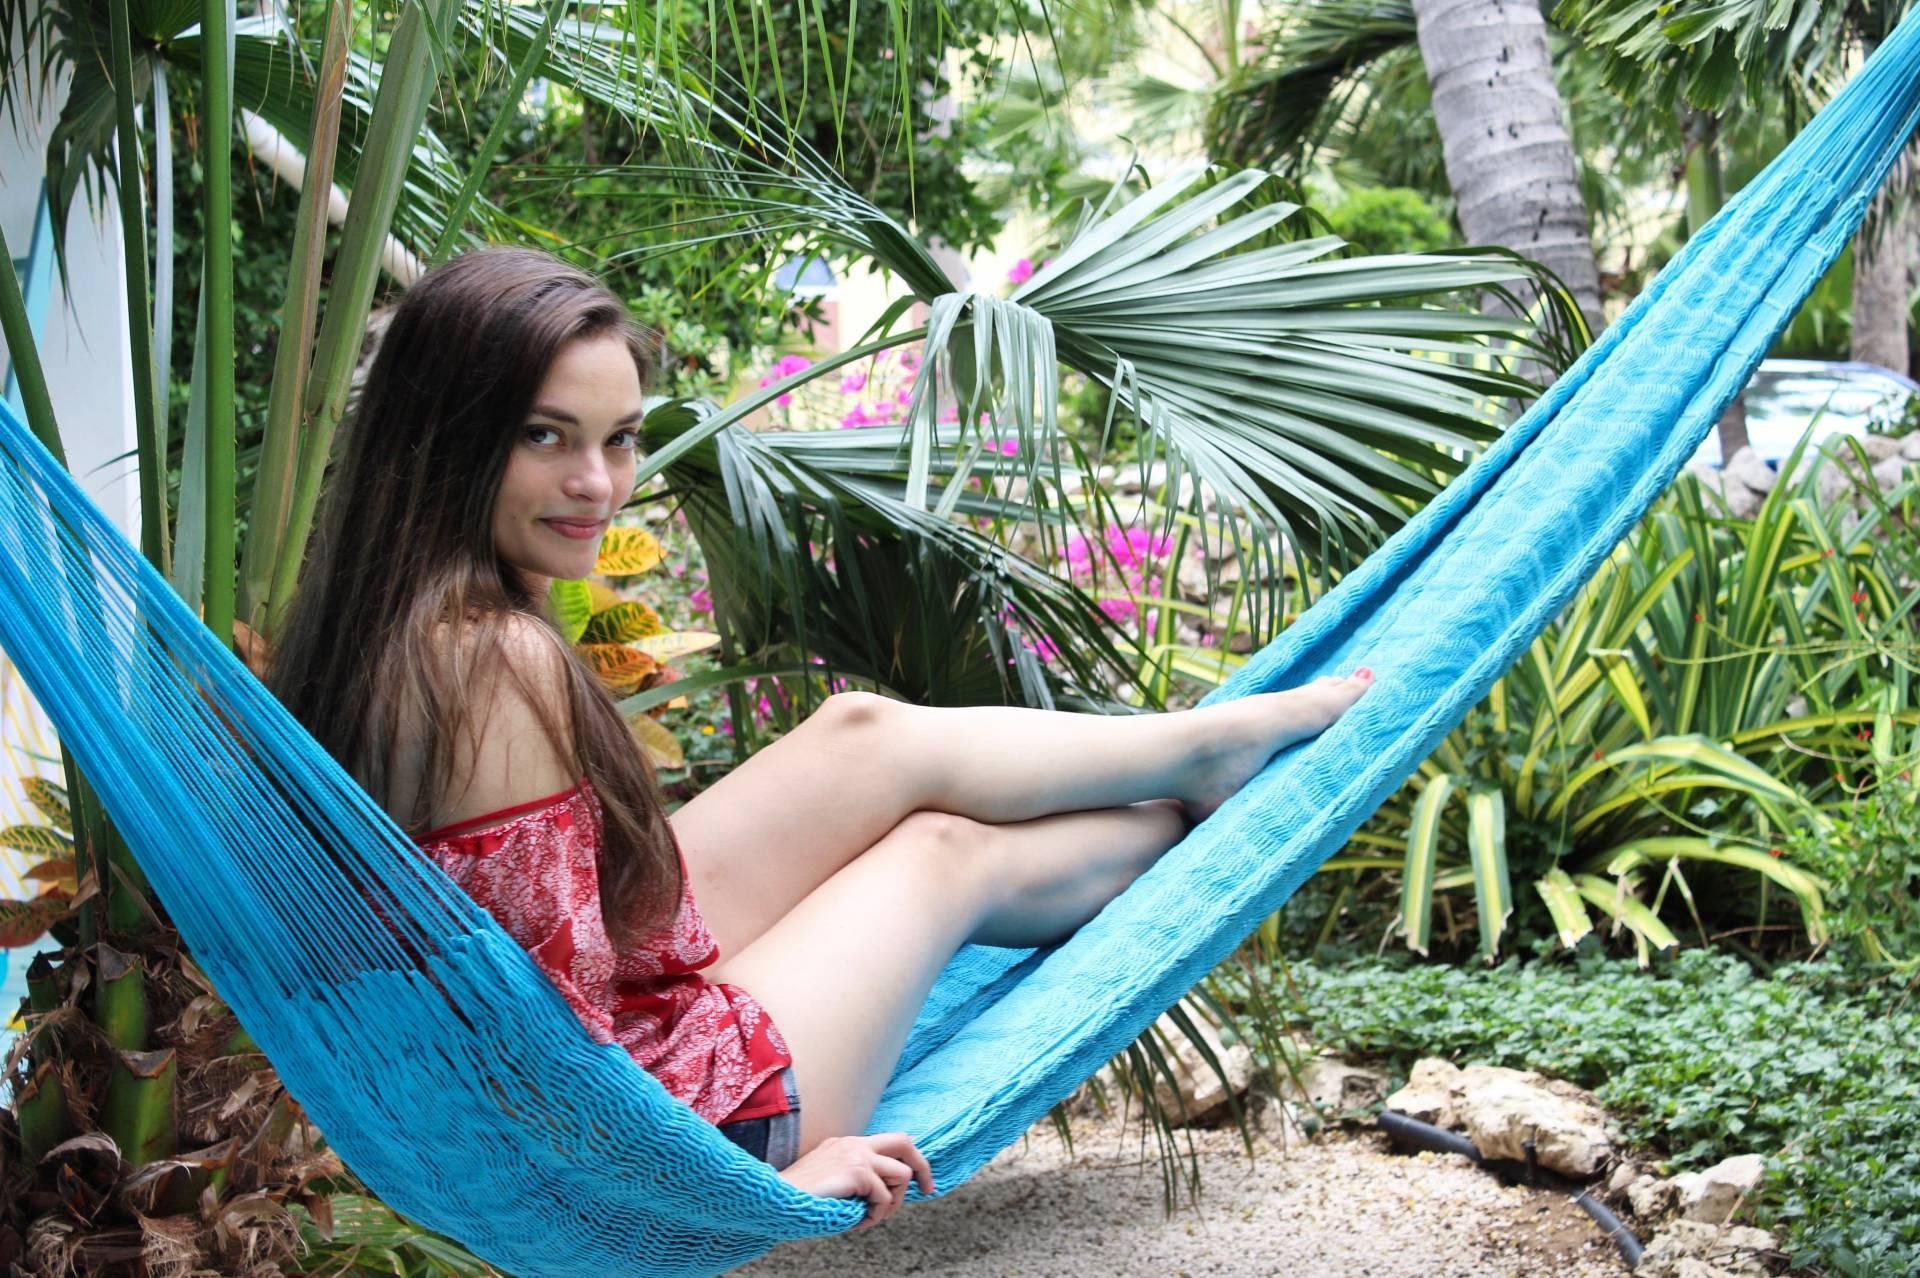 One Happy Hotel: My Boardwalk Small Hotel Aruba Review